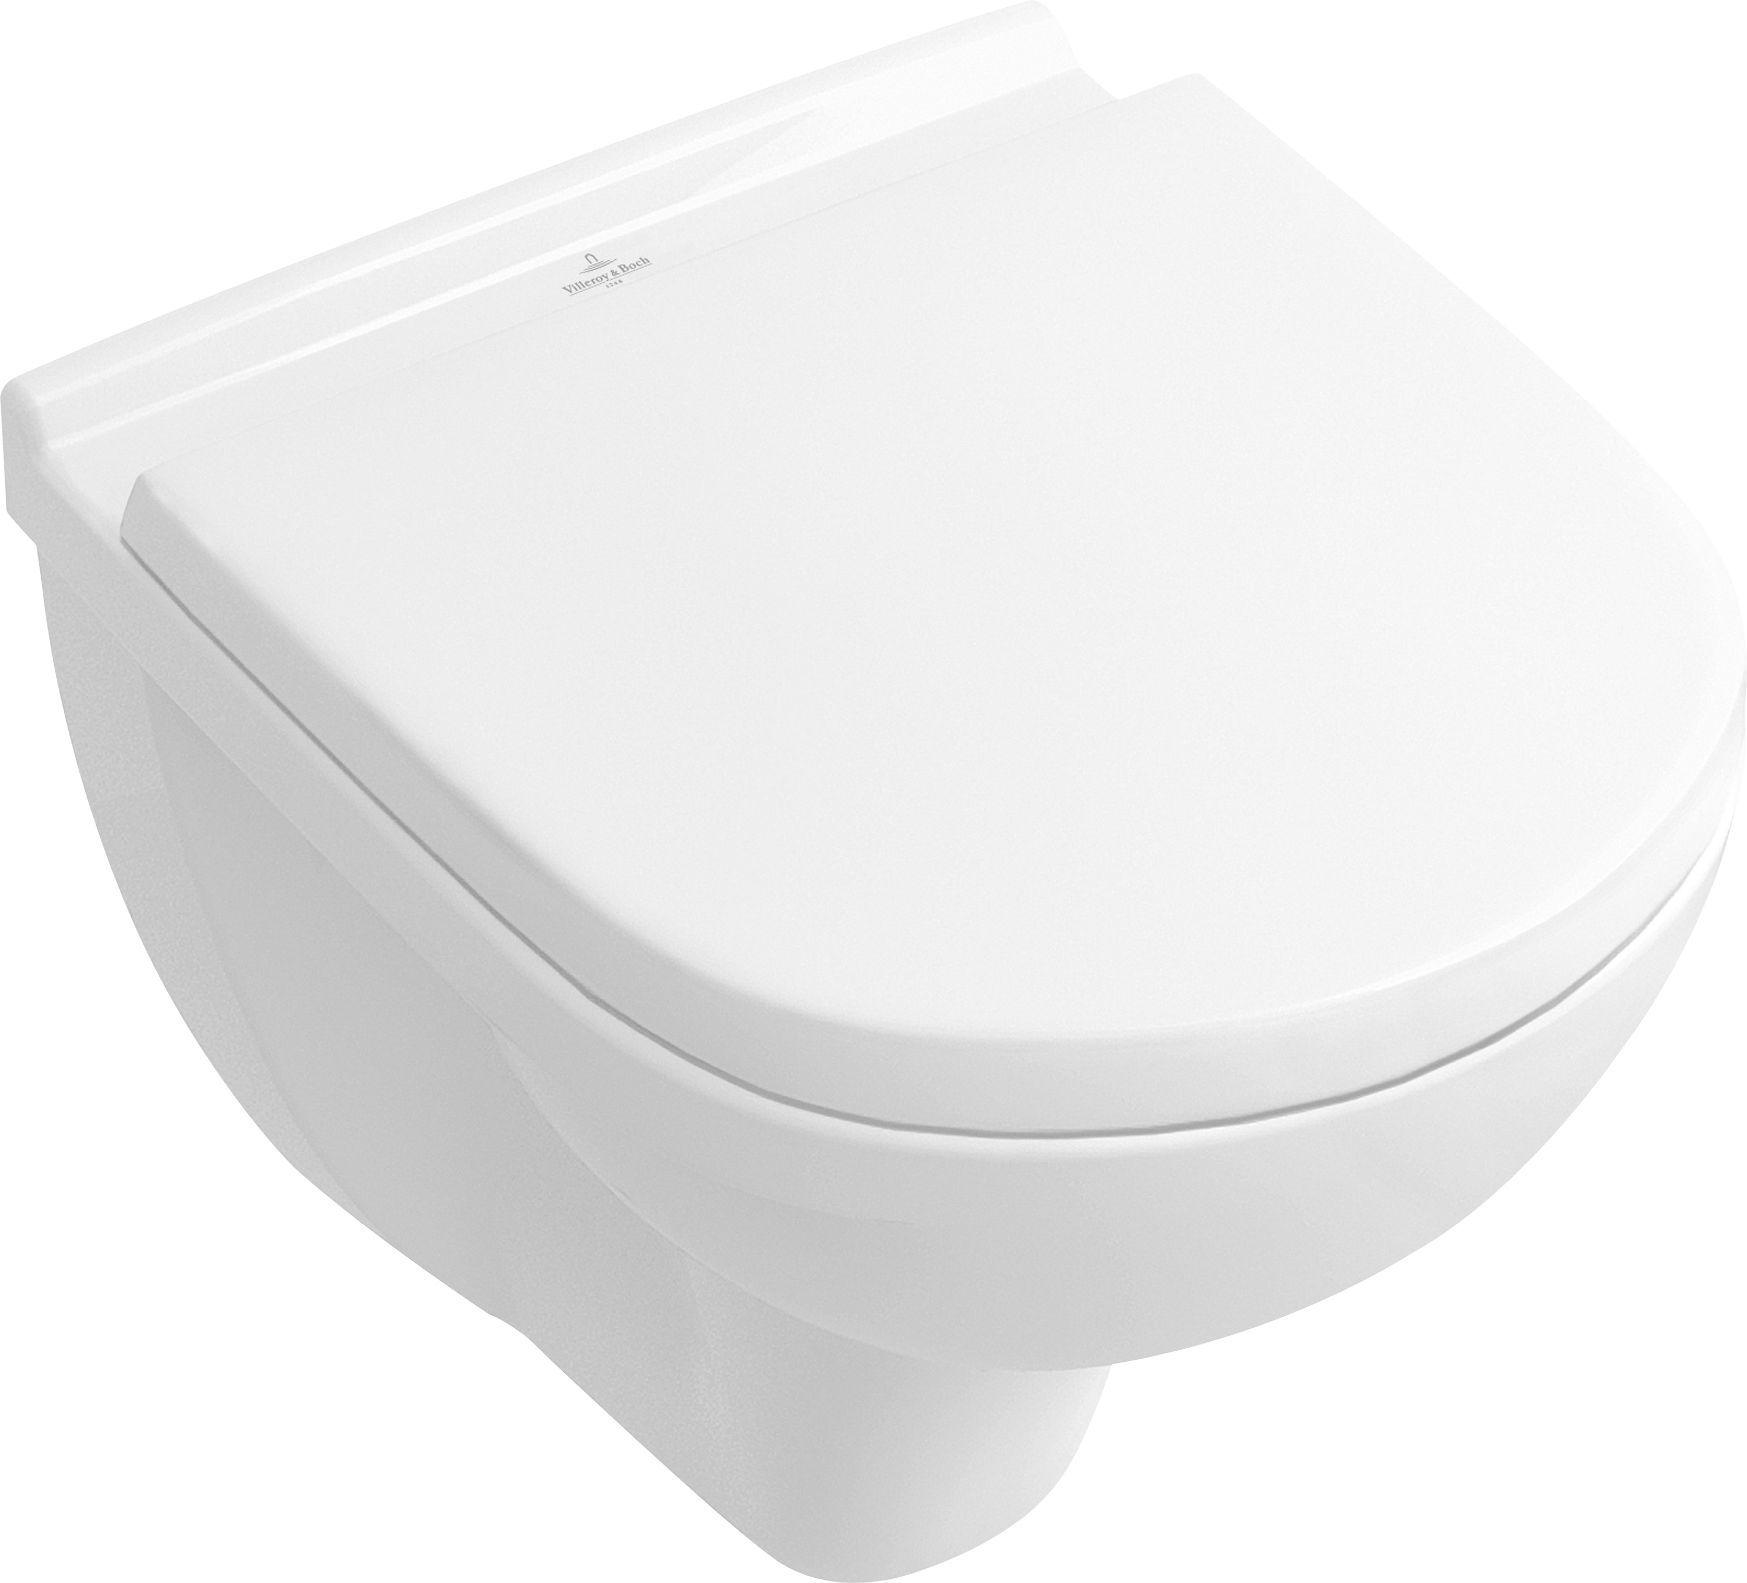 Villeroy & Boch O.Novo Compact Tiefspül-Wand-WC L:49xB:36cm DirectFlush mit offenem Spülrand weiß mit CeramicPlus 5688R0R1